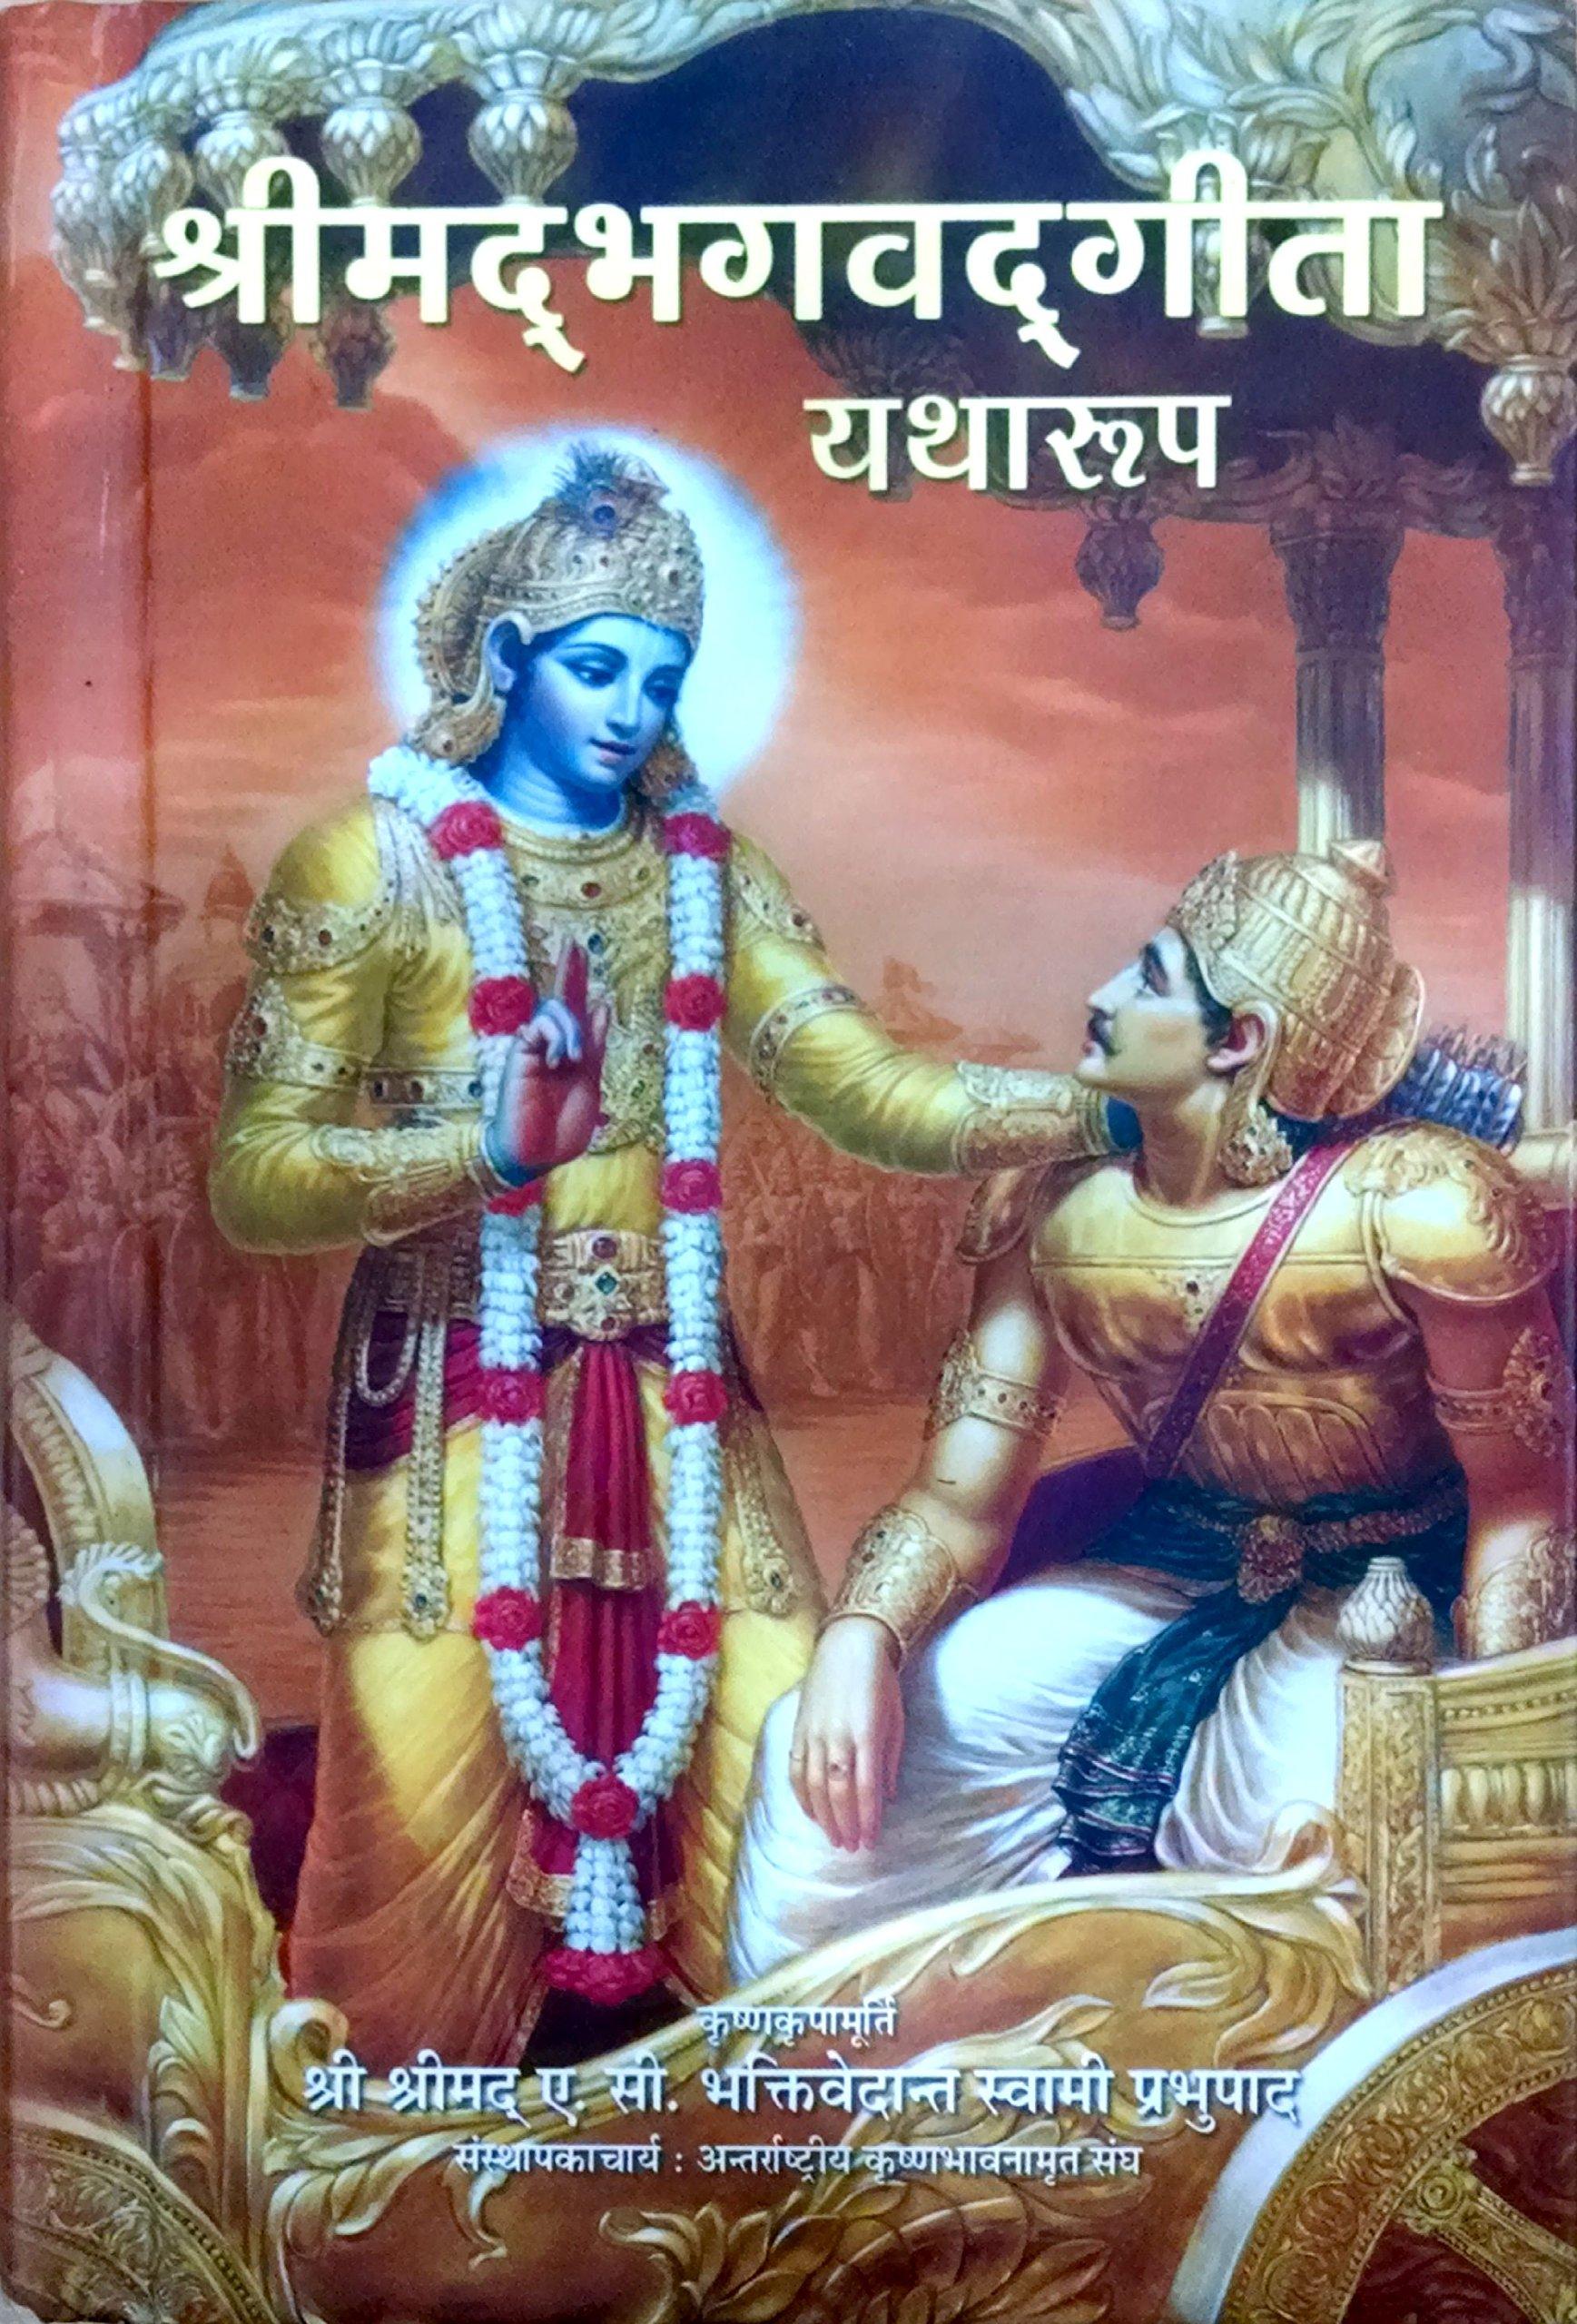 Bhagavad Gita: Yatharoop (Hindi)